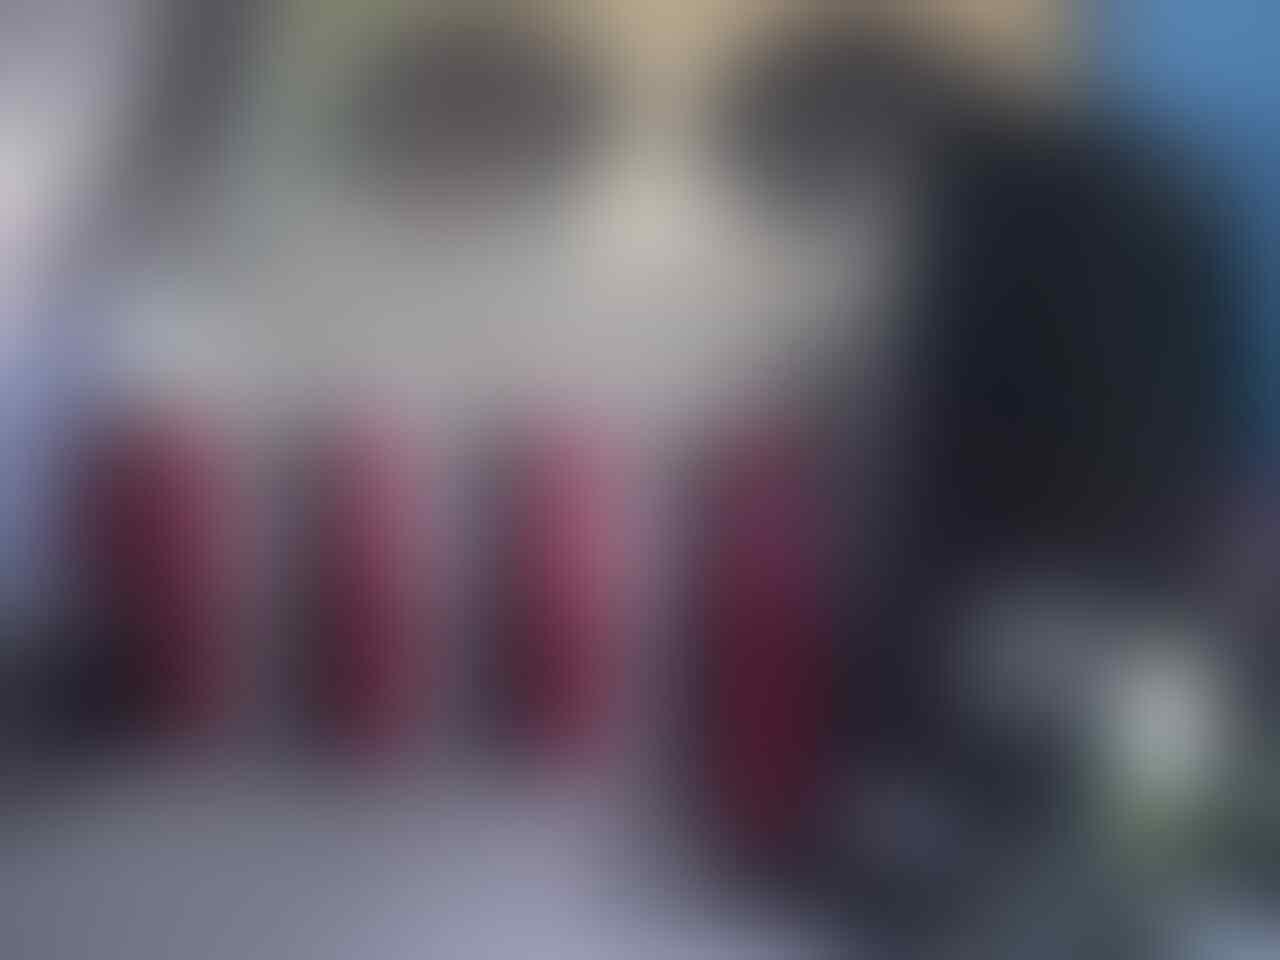 grosir Rokok elektrik / vapourizer malang : ego ce5, evod, x6 kamry, vision spinner 2